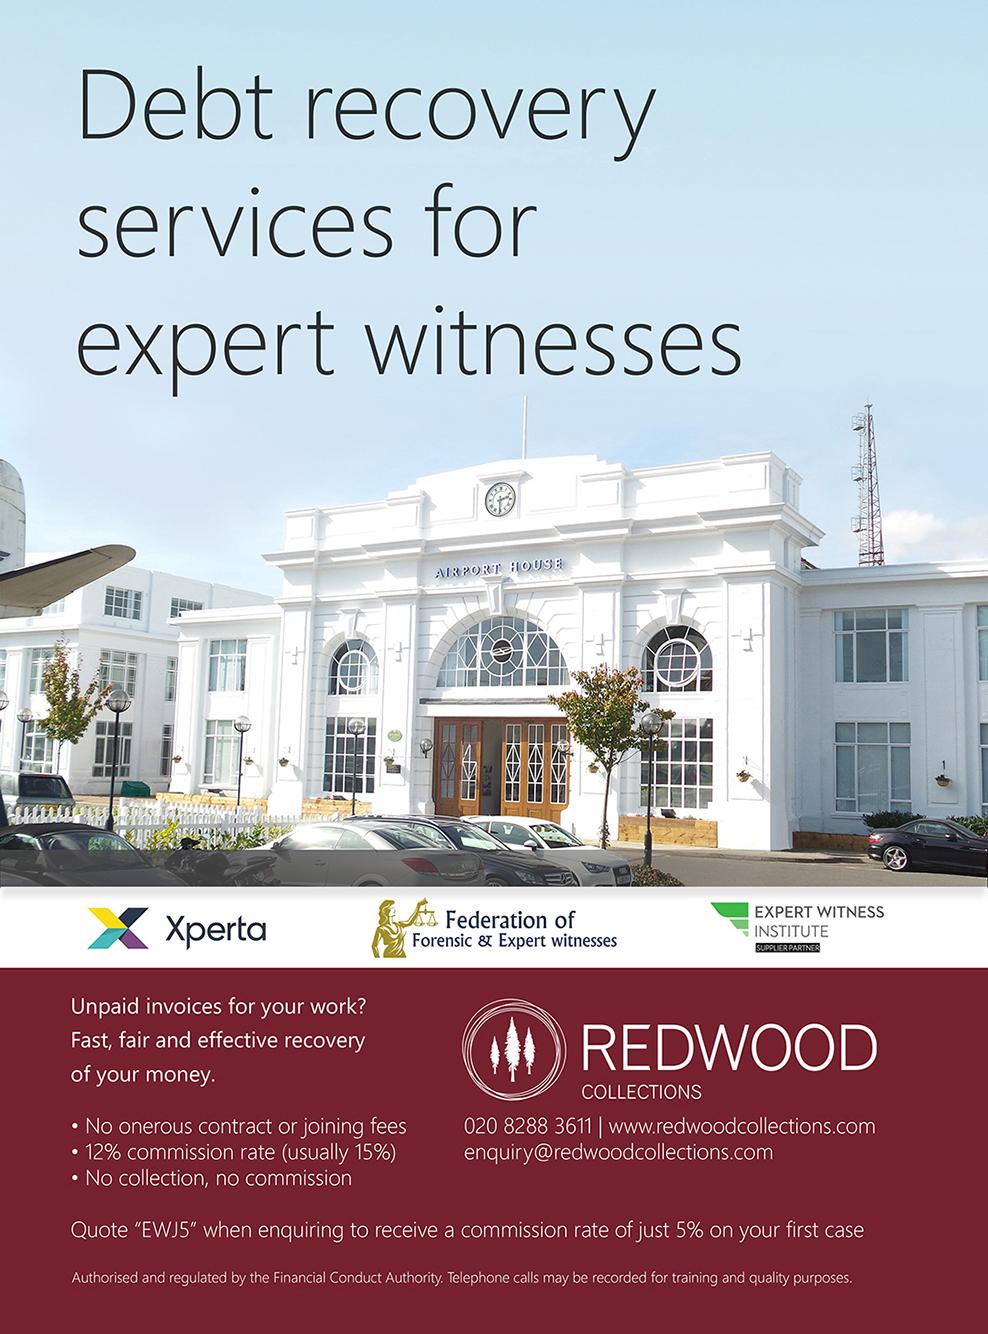 redwood-web-20